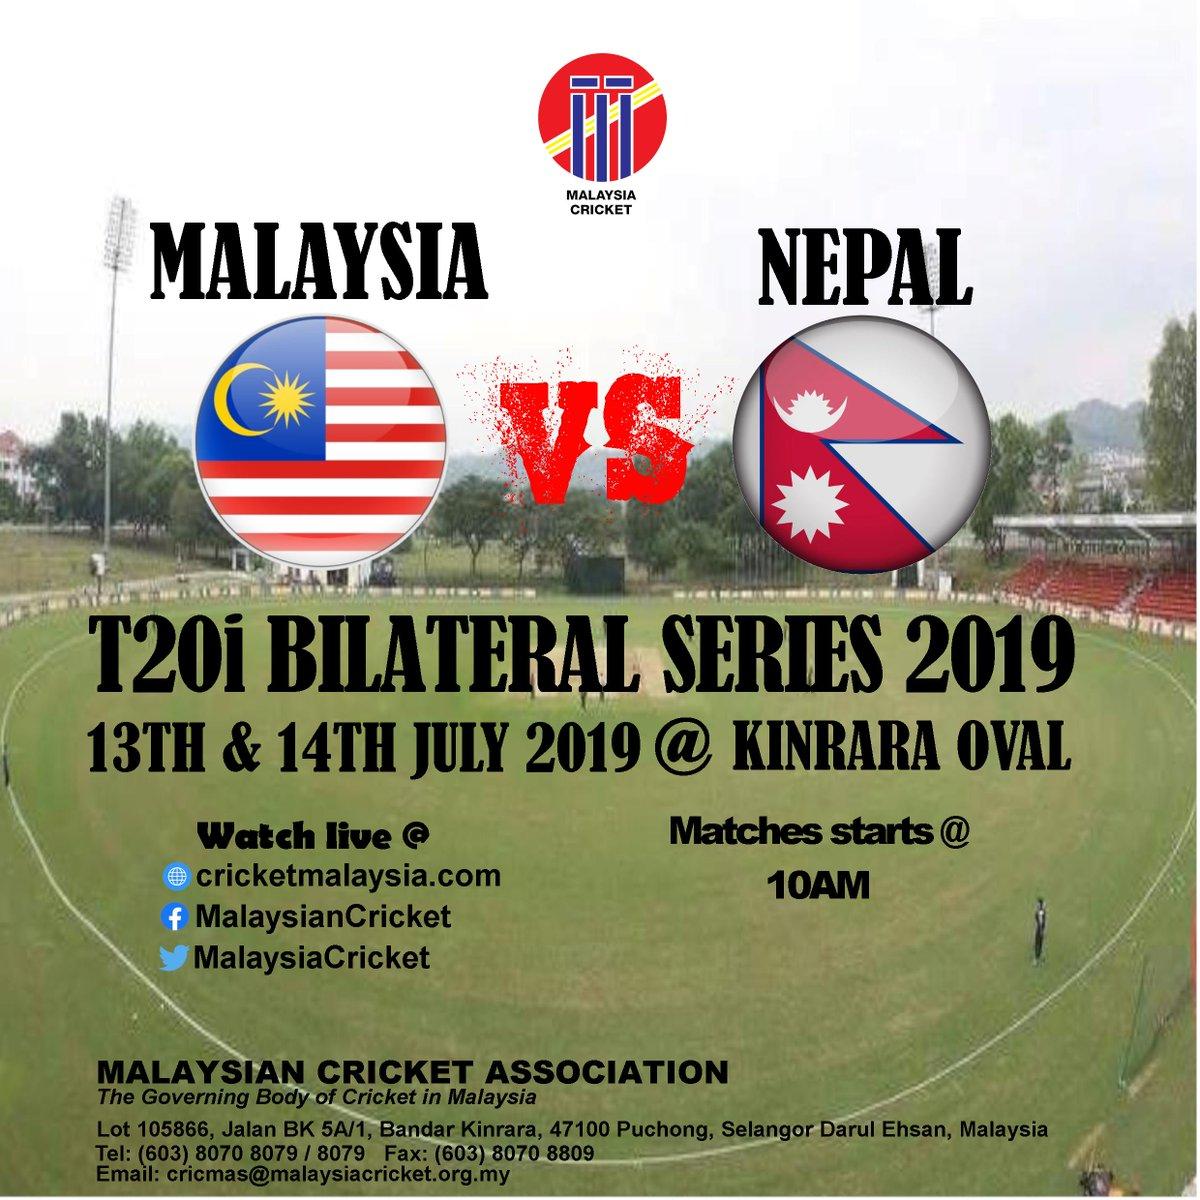 Malaysia Cricket (@MalaysiaCricket) | Twitter